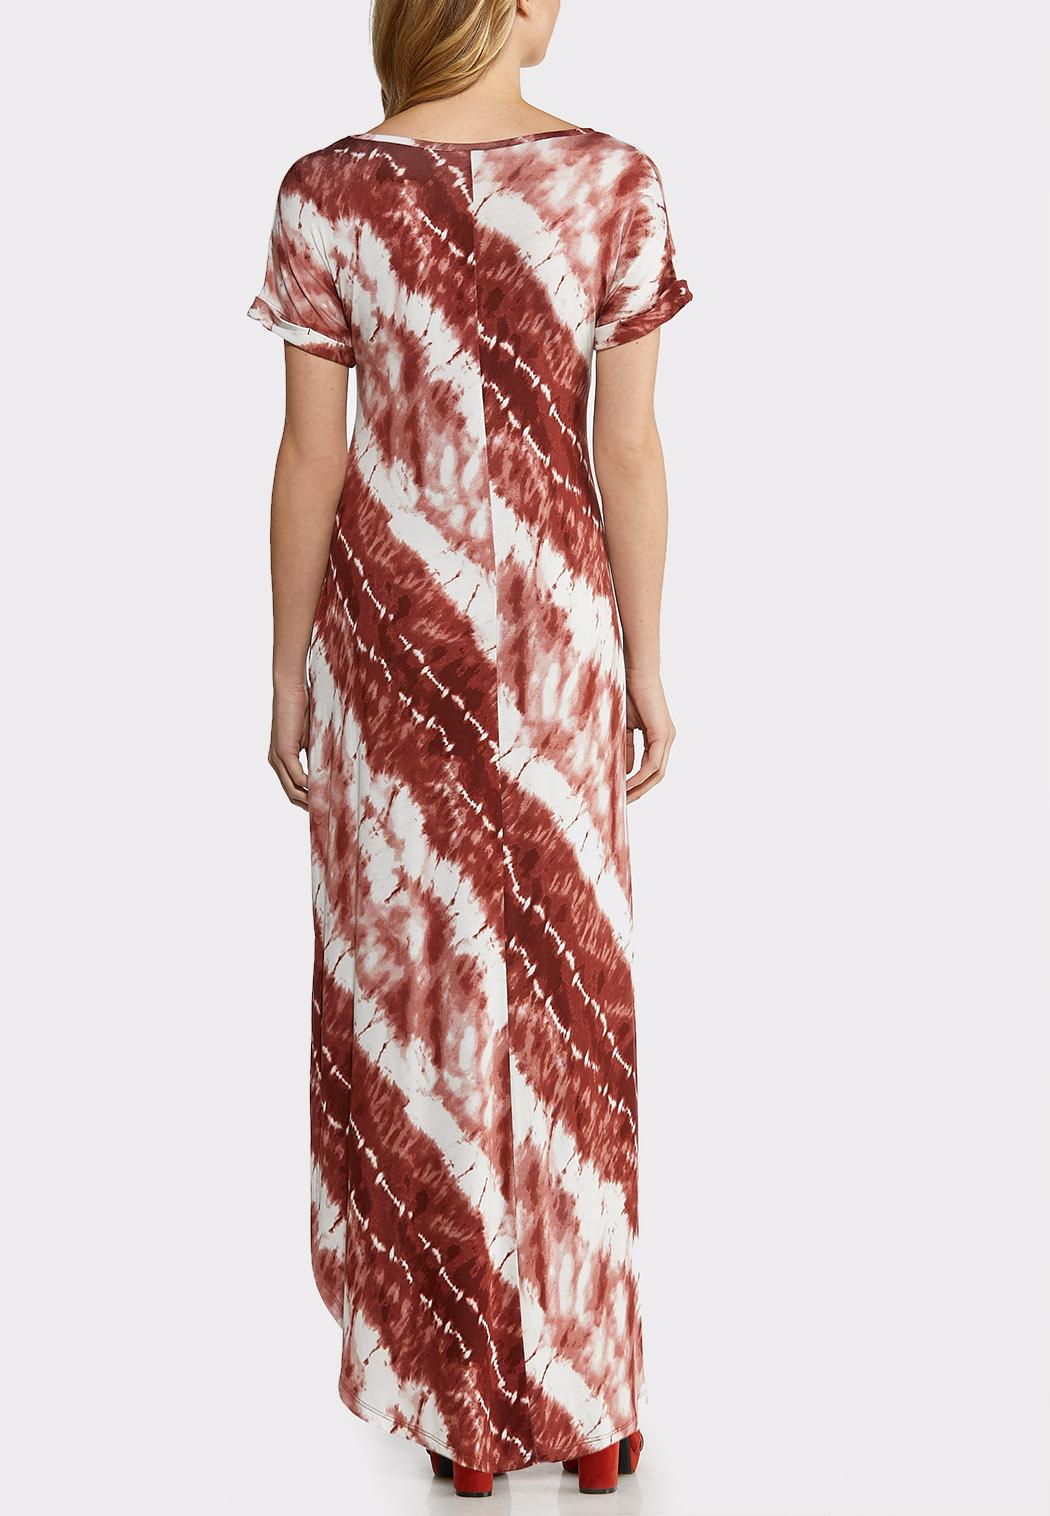 Petite Tie Dye Maxi Dress (Item #44142445)